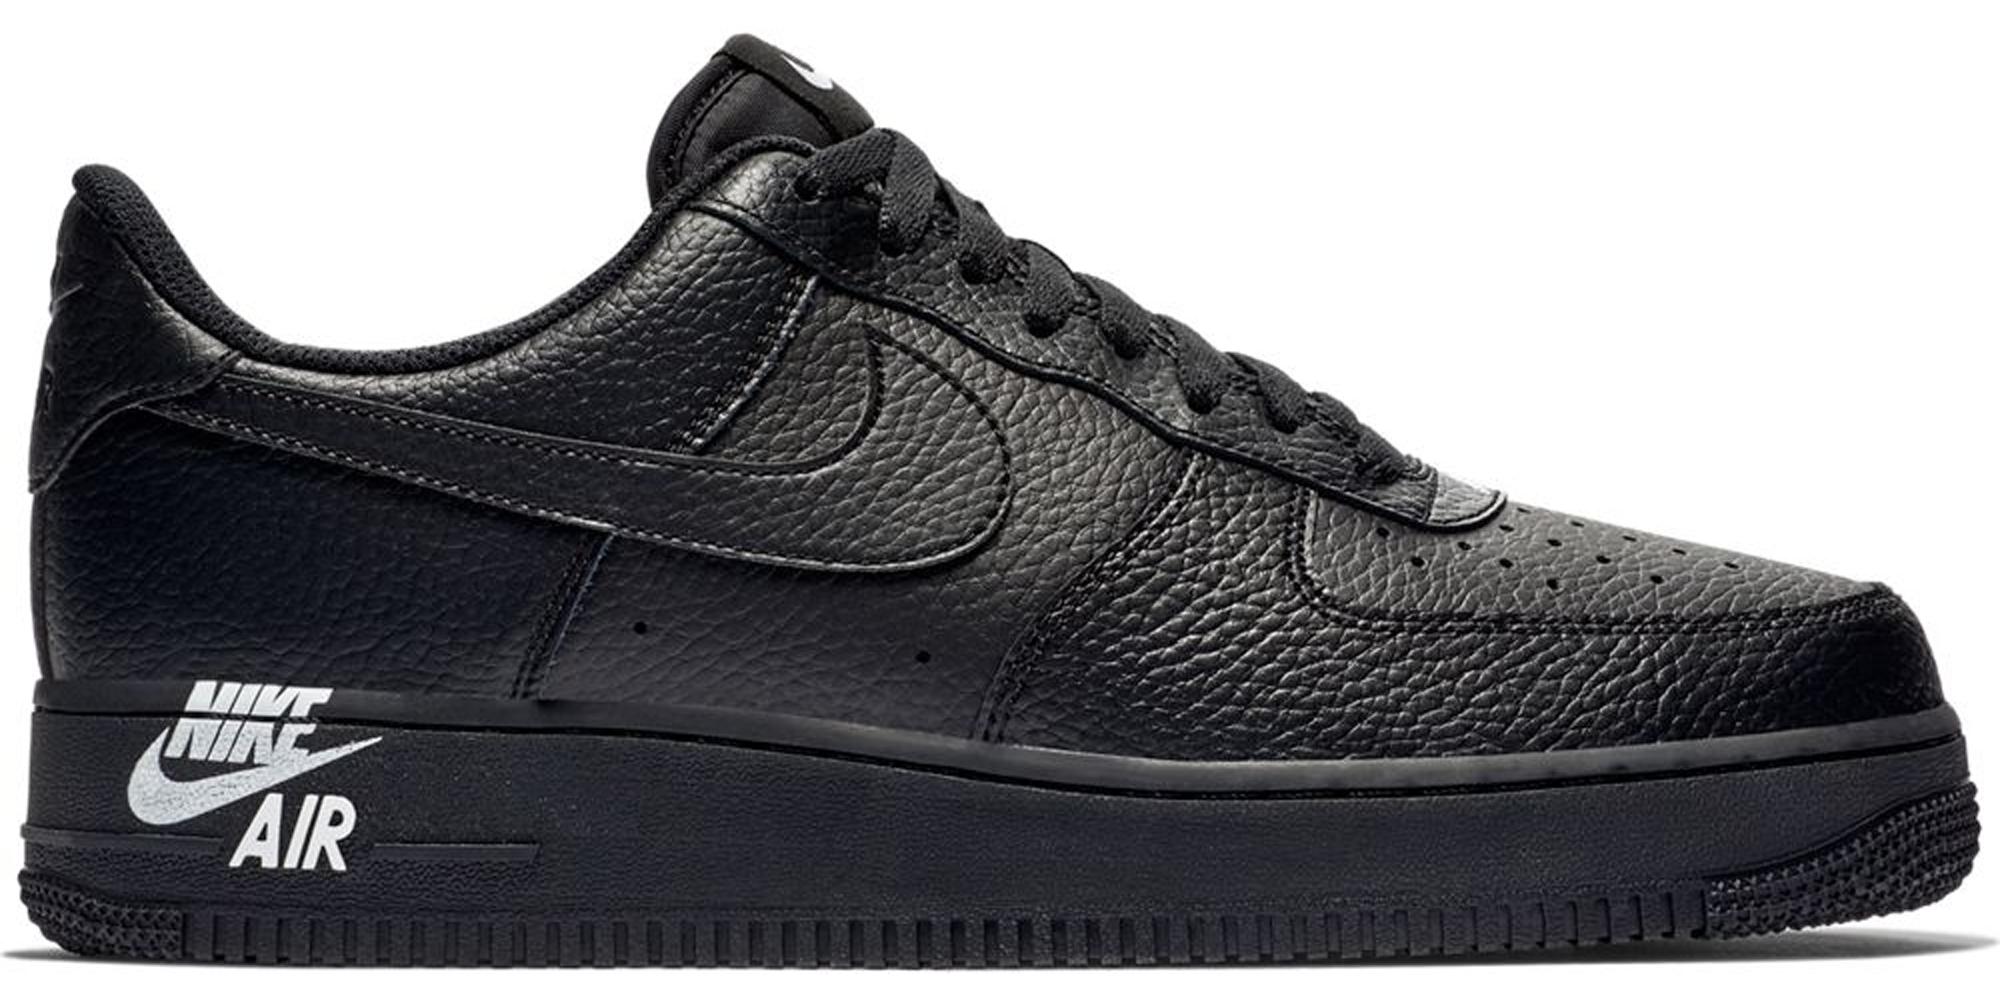 Nike Air Force 1 Low Black Black White